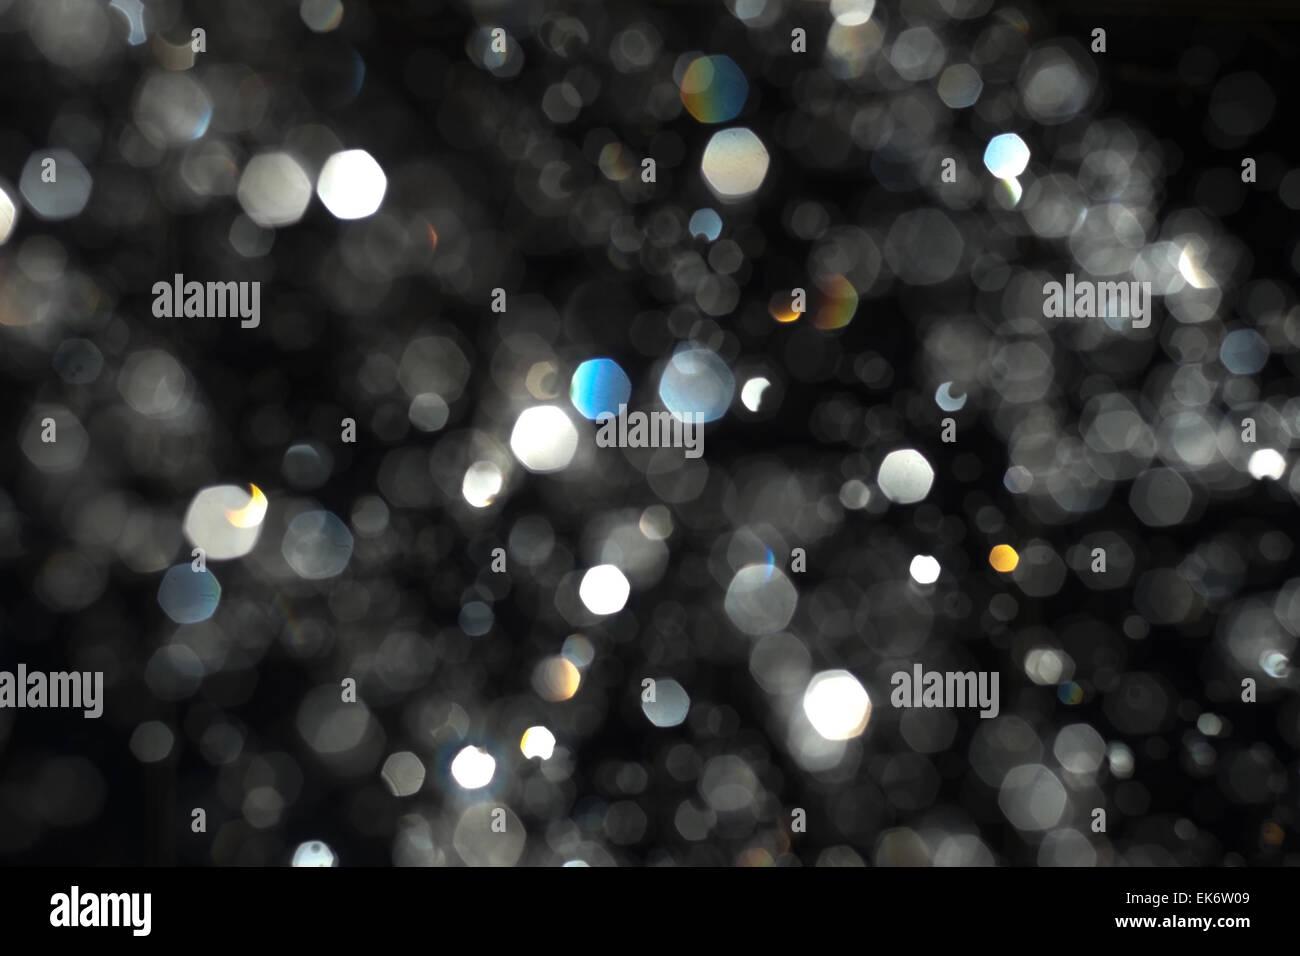 Abstract  bokeh. Blurred water drops backlit. Levitation of rain drops defocused - Stock Image